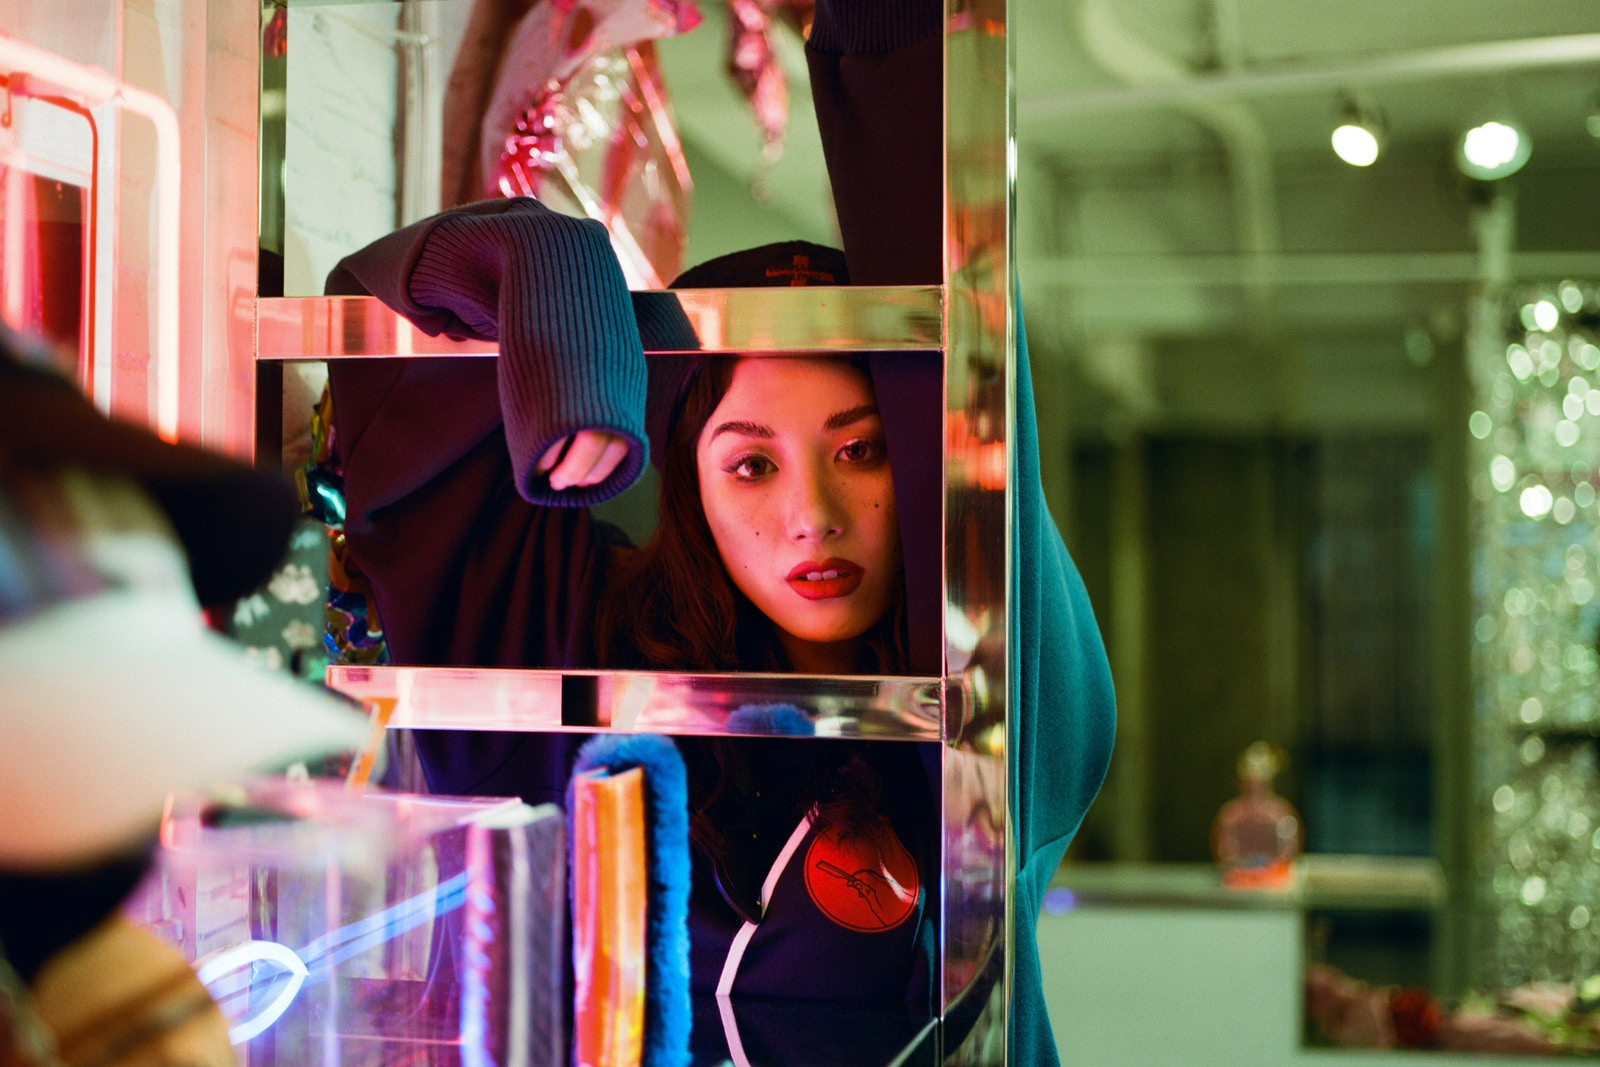 HYPEBAE 專訪台灣潮流女指標 Stars Xu 談論個人風格的建立